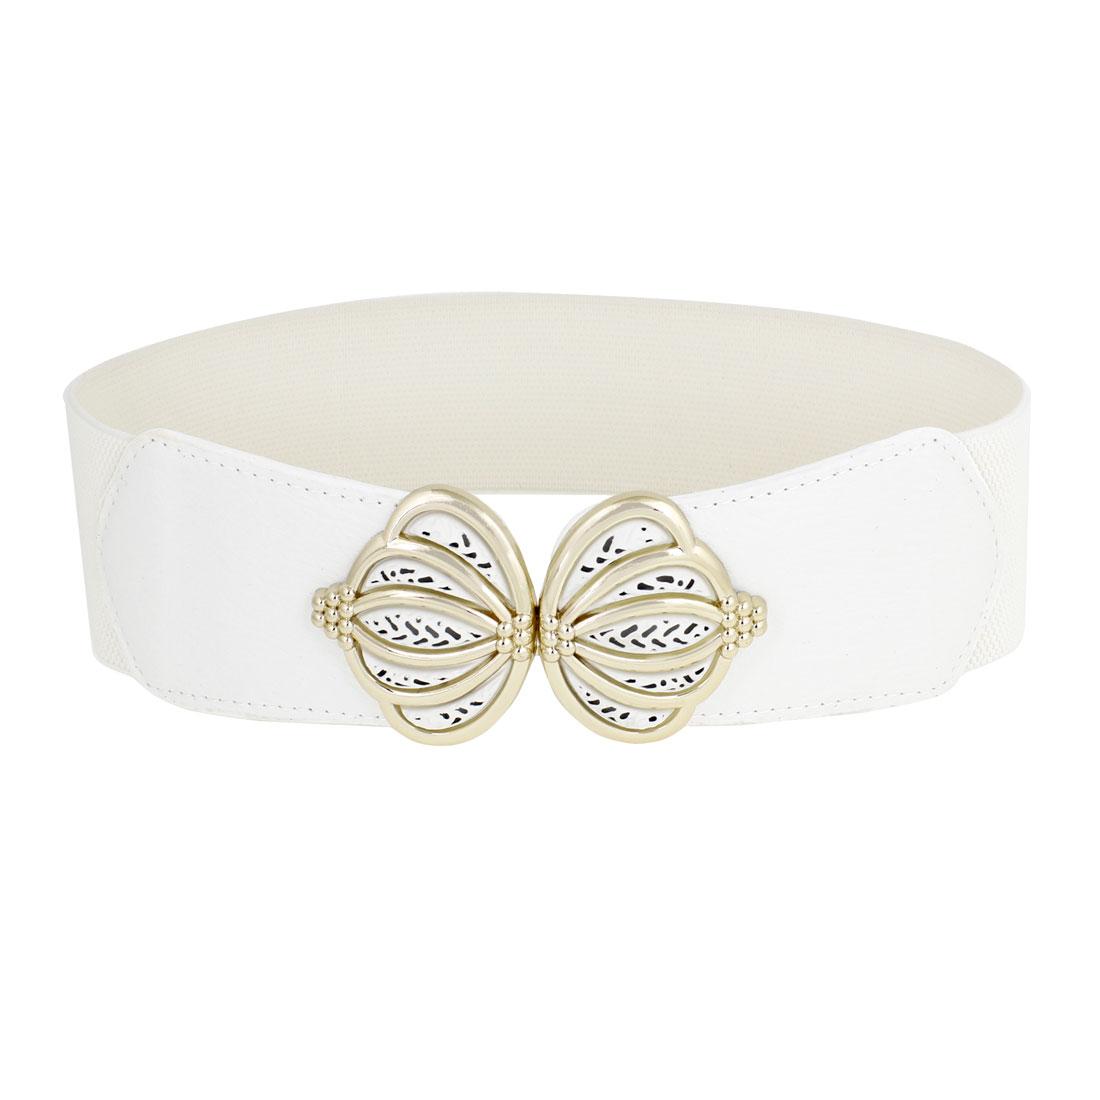 Woman Lady 6cm Width Crown Interlock Buckle Stretch Waist Cinch Belt White